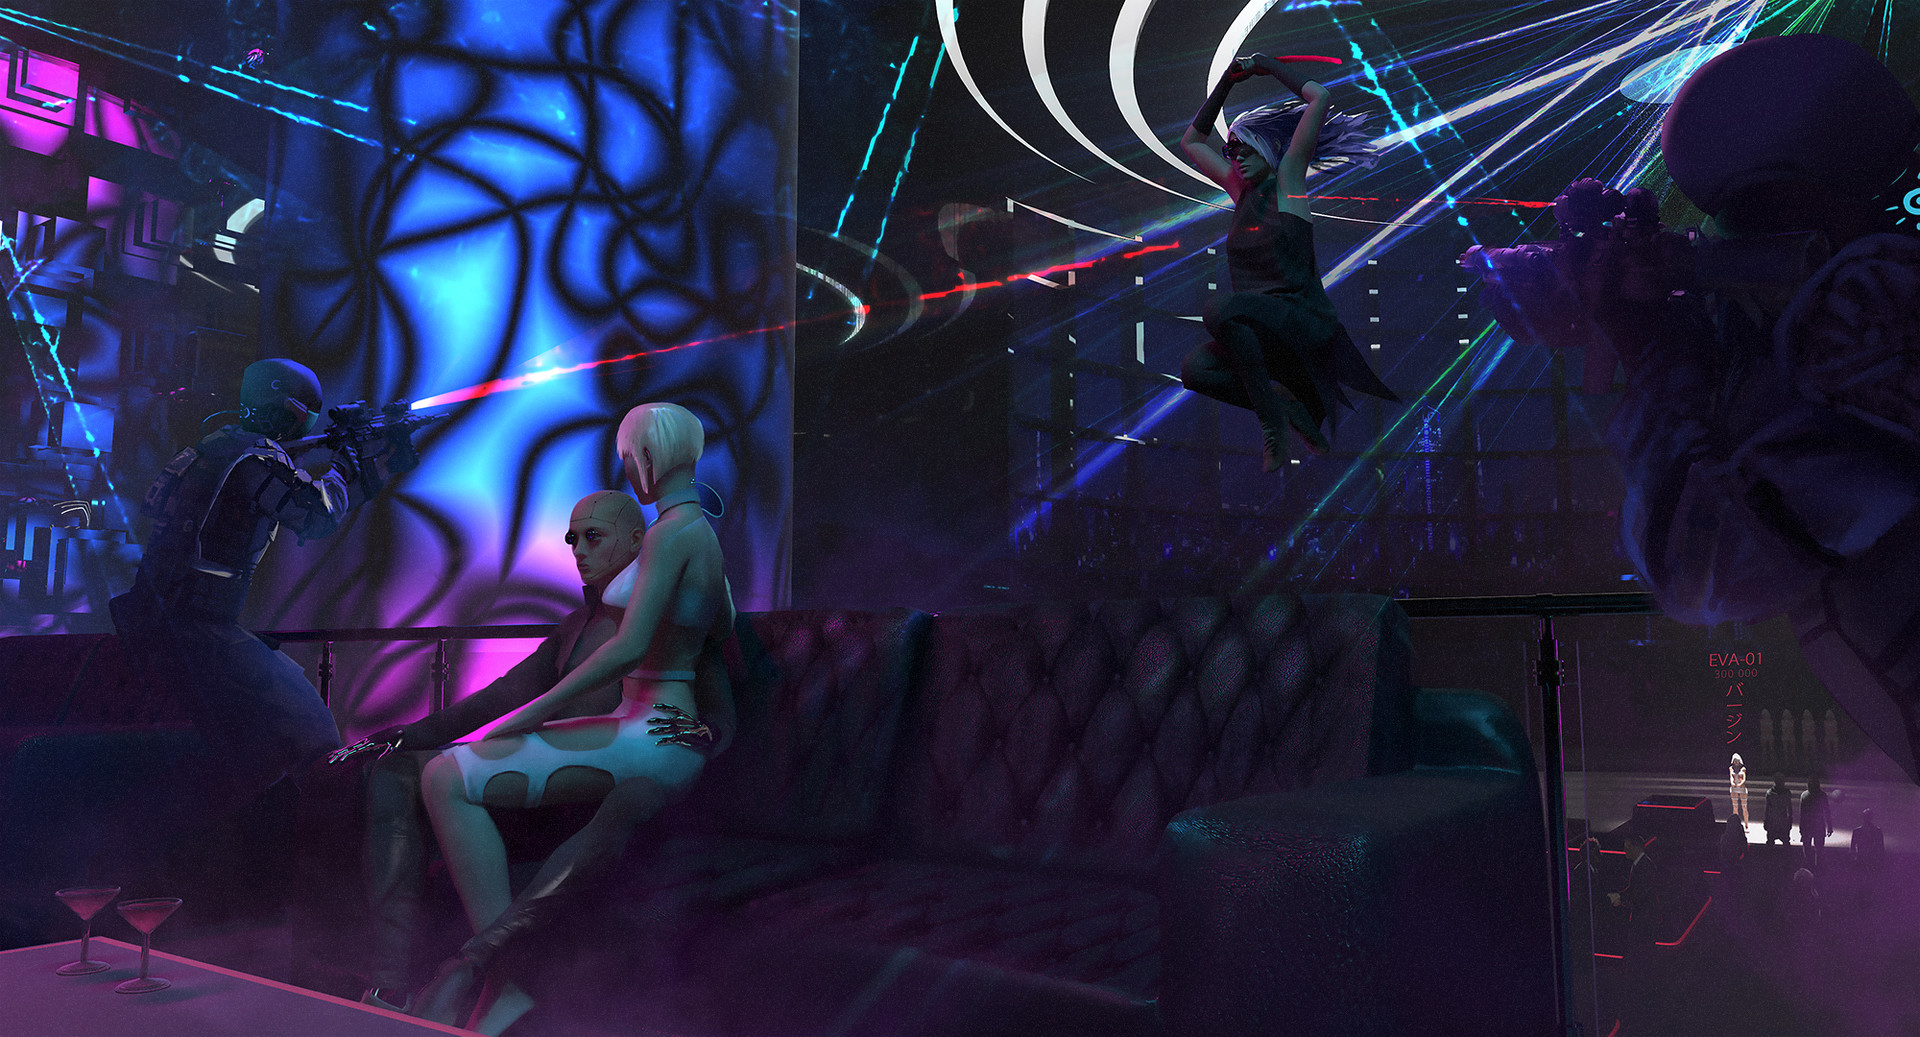 Tomasz smolka conceptdesign cyberpunk club ts final noise 2k